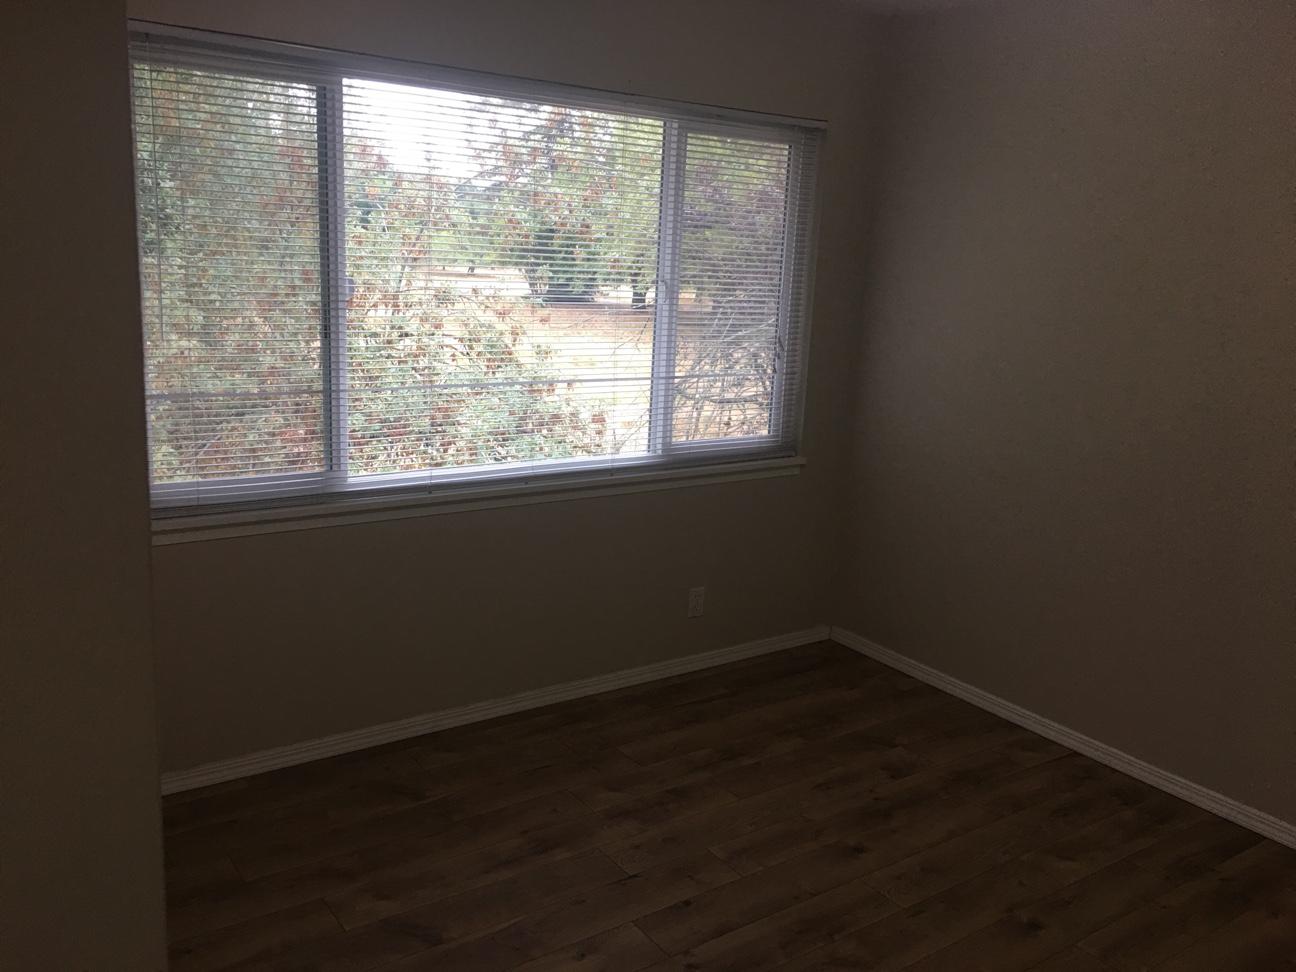 3820 Sumner Lane, Santa Rosa, California, United States 95405, 1 Bedroom Bedrooms, ,1 BathroomBathrooms,Apartment,One Bedroom,Sumner Lane,1689